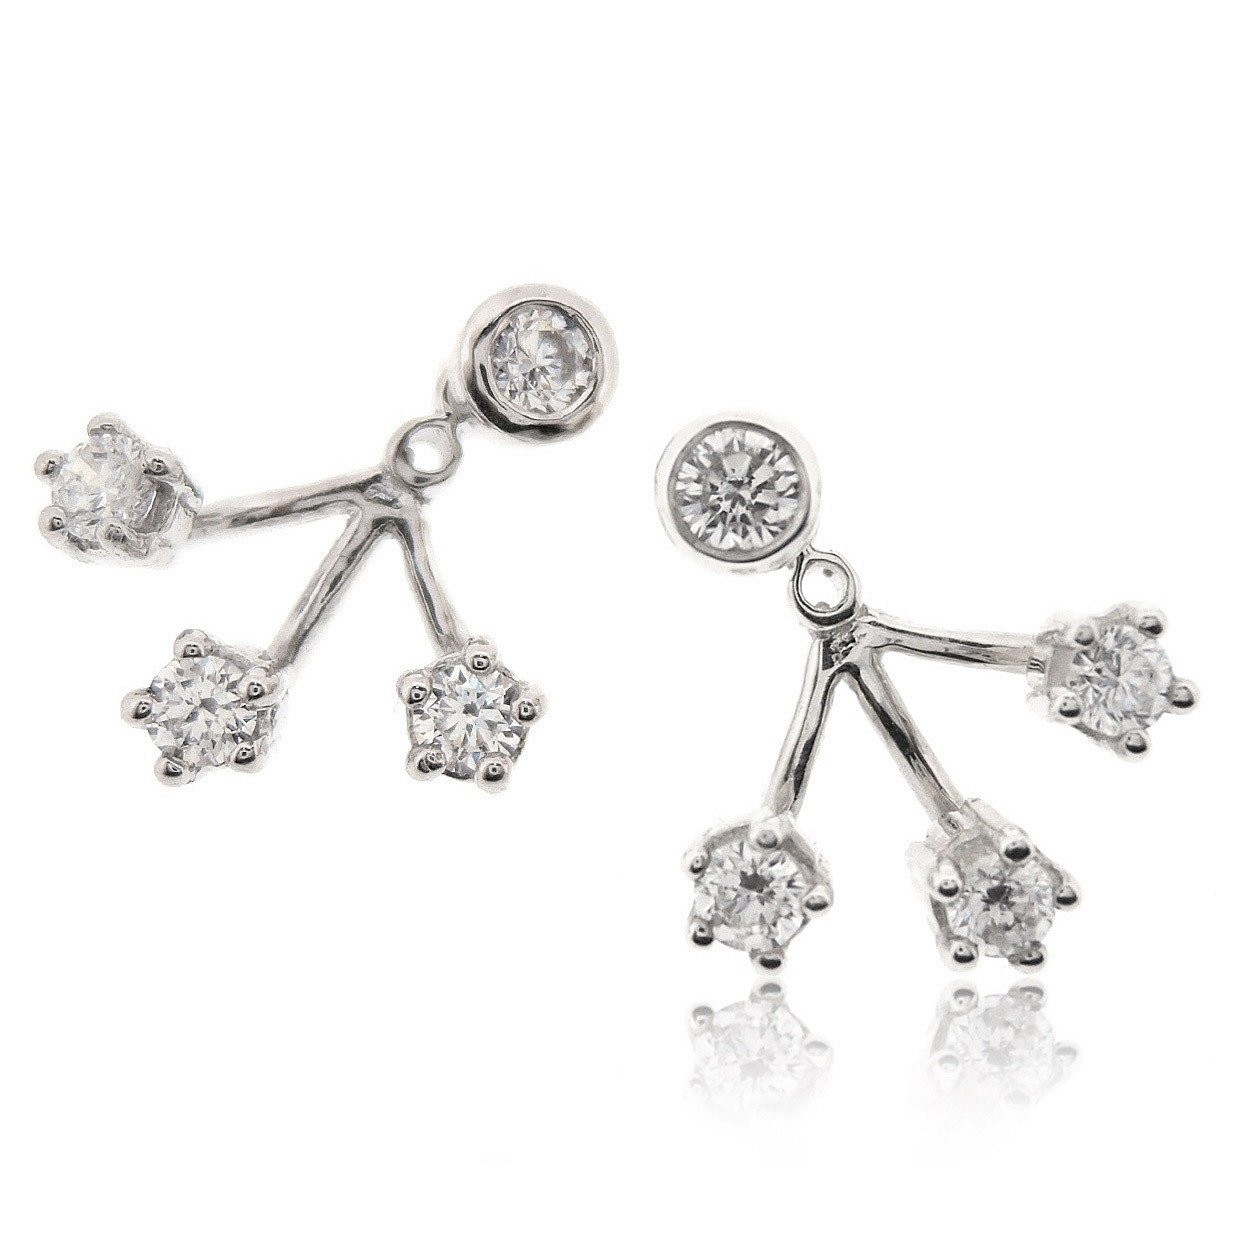 Sovats Woman Gift Two Way Earrings''CZ''